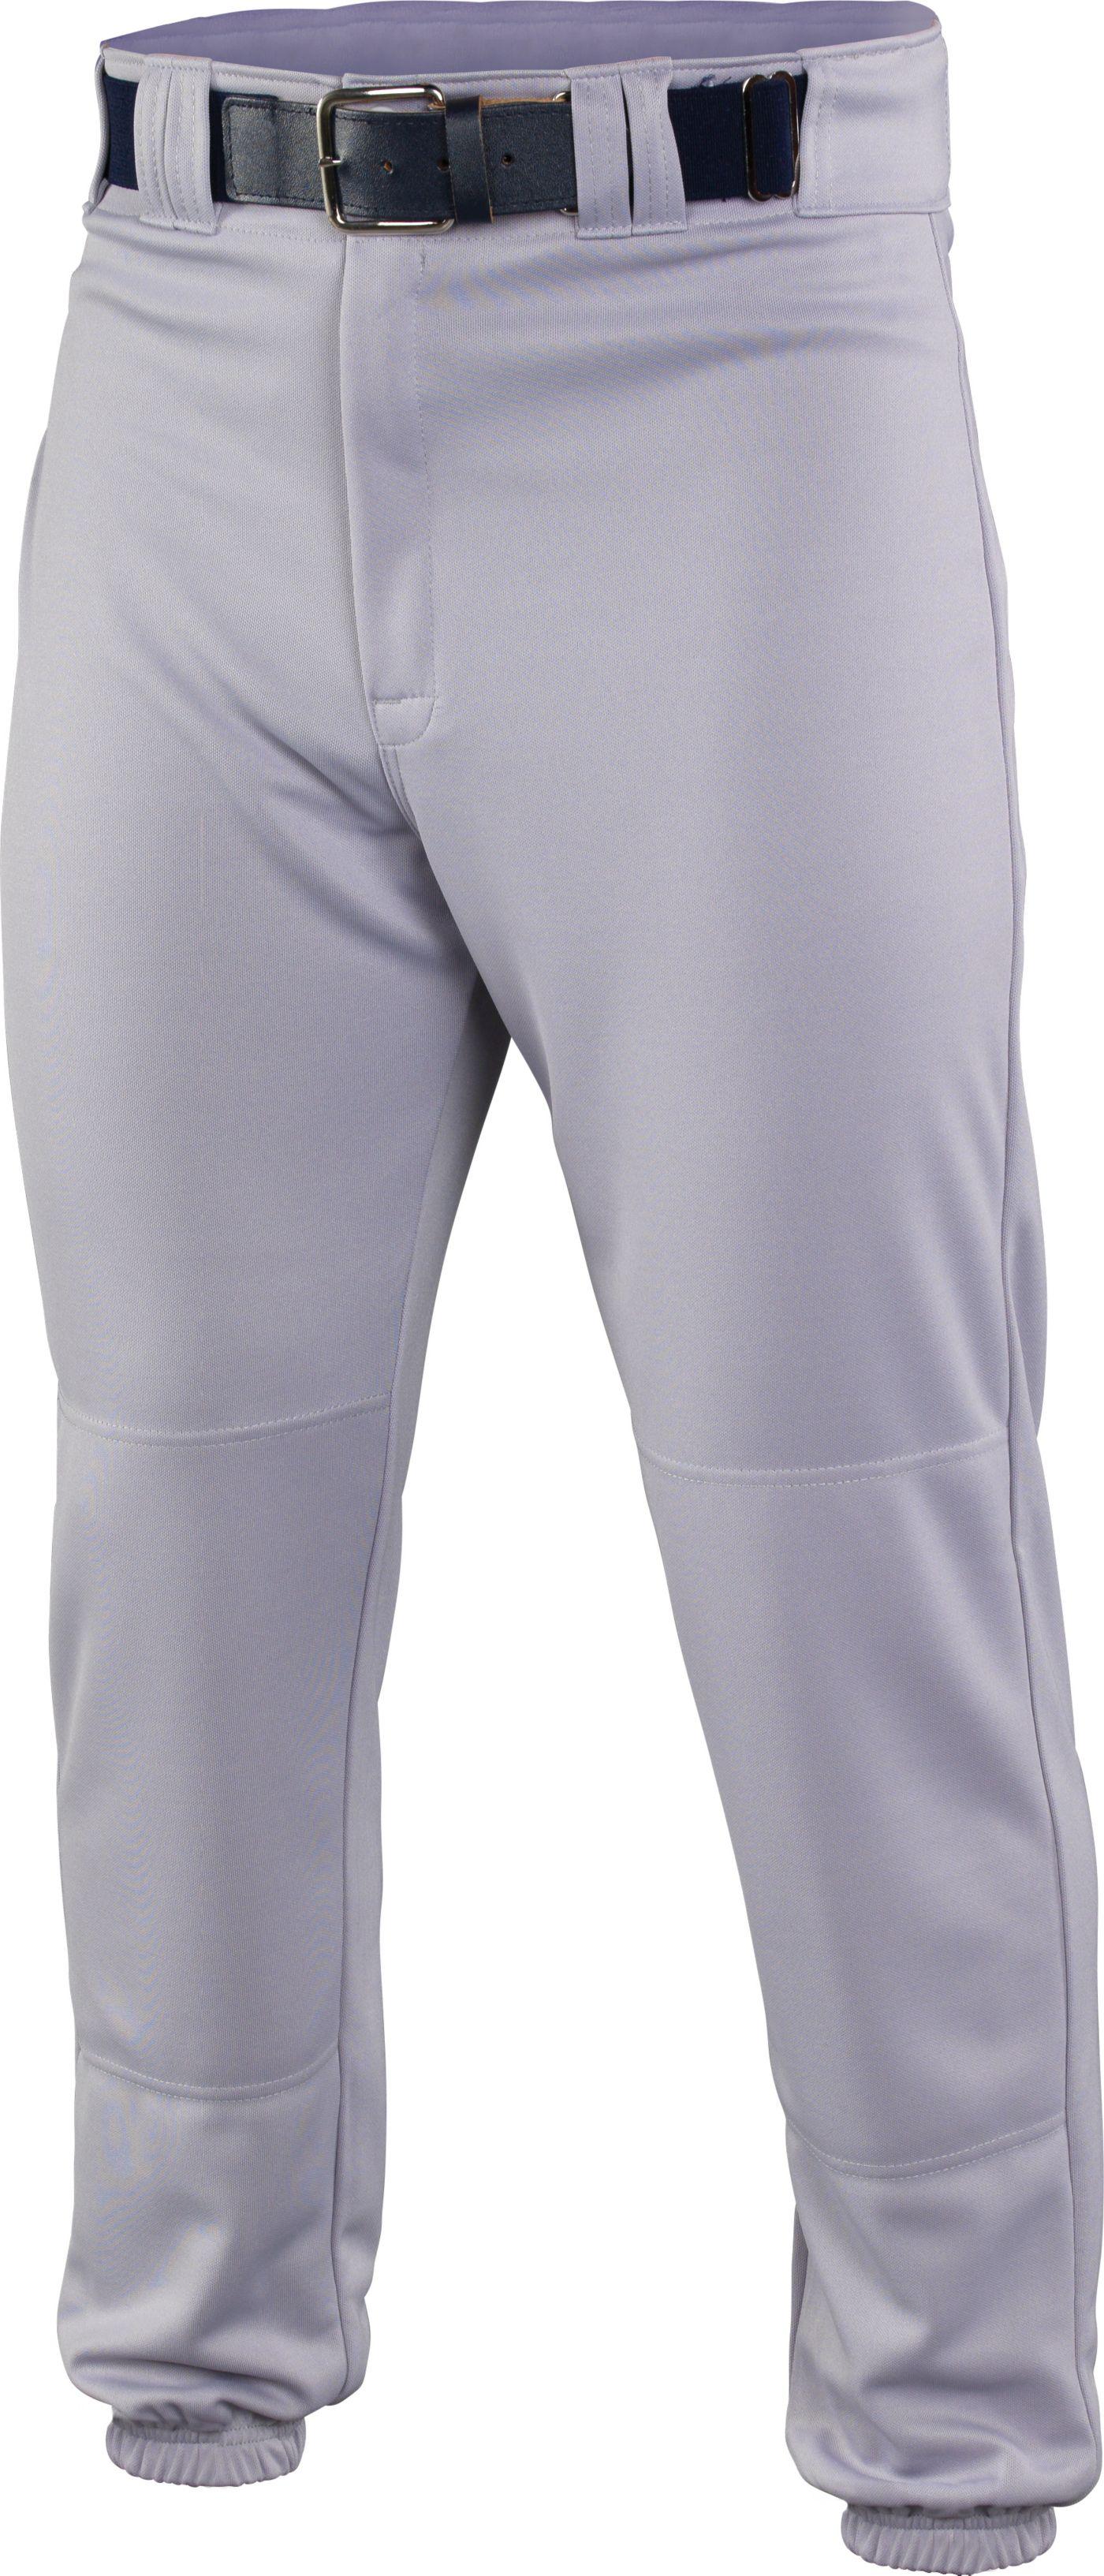 Easton Boys' Deluxe Baseball Pants